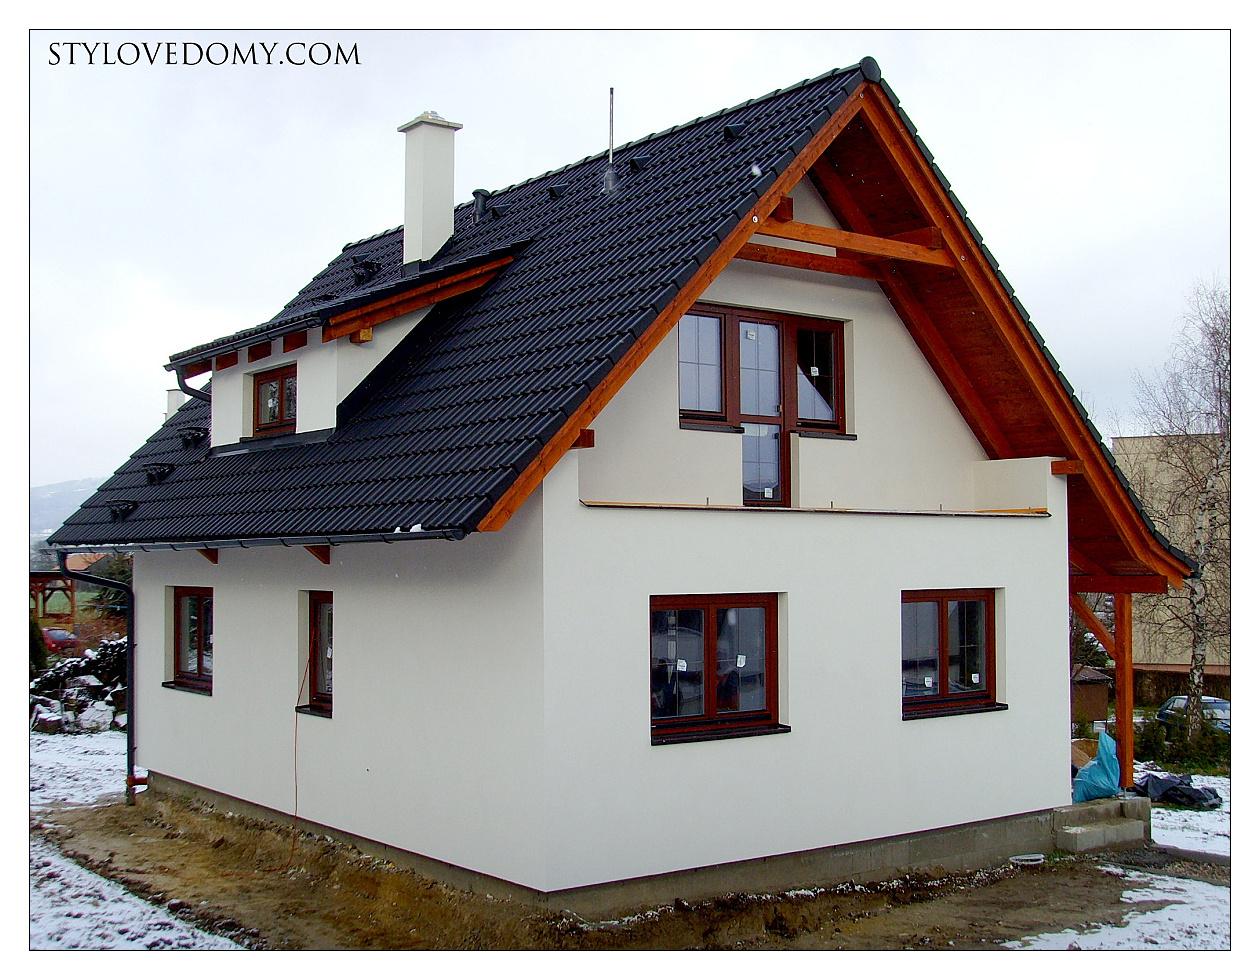 stylove_domy_SD99A_003